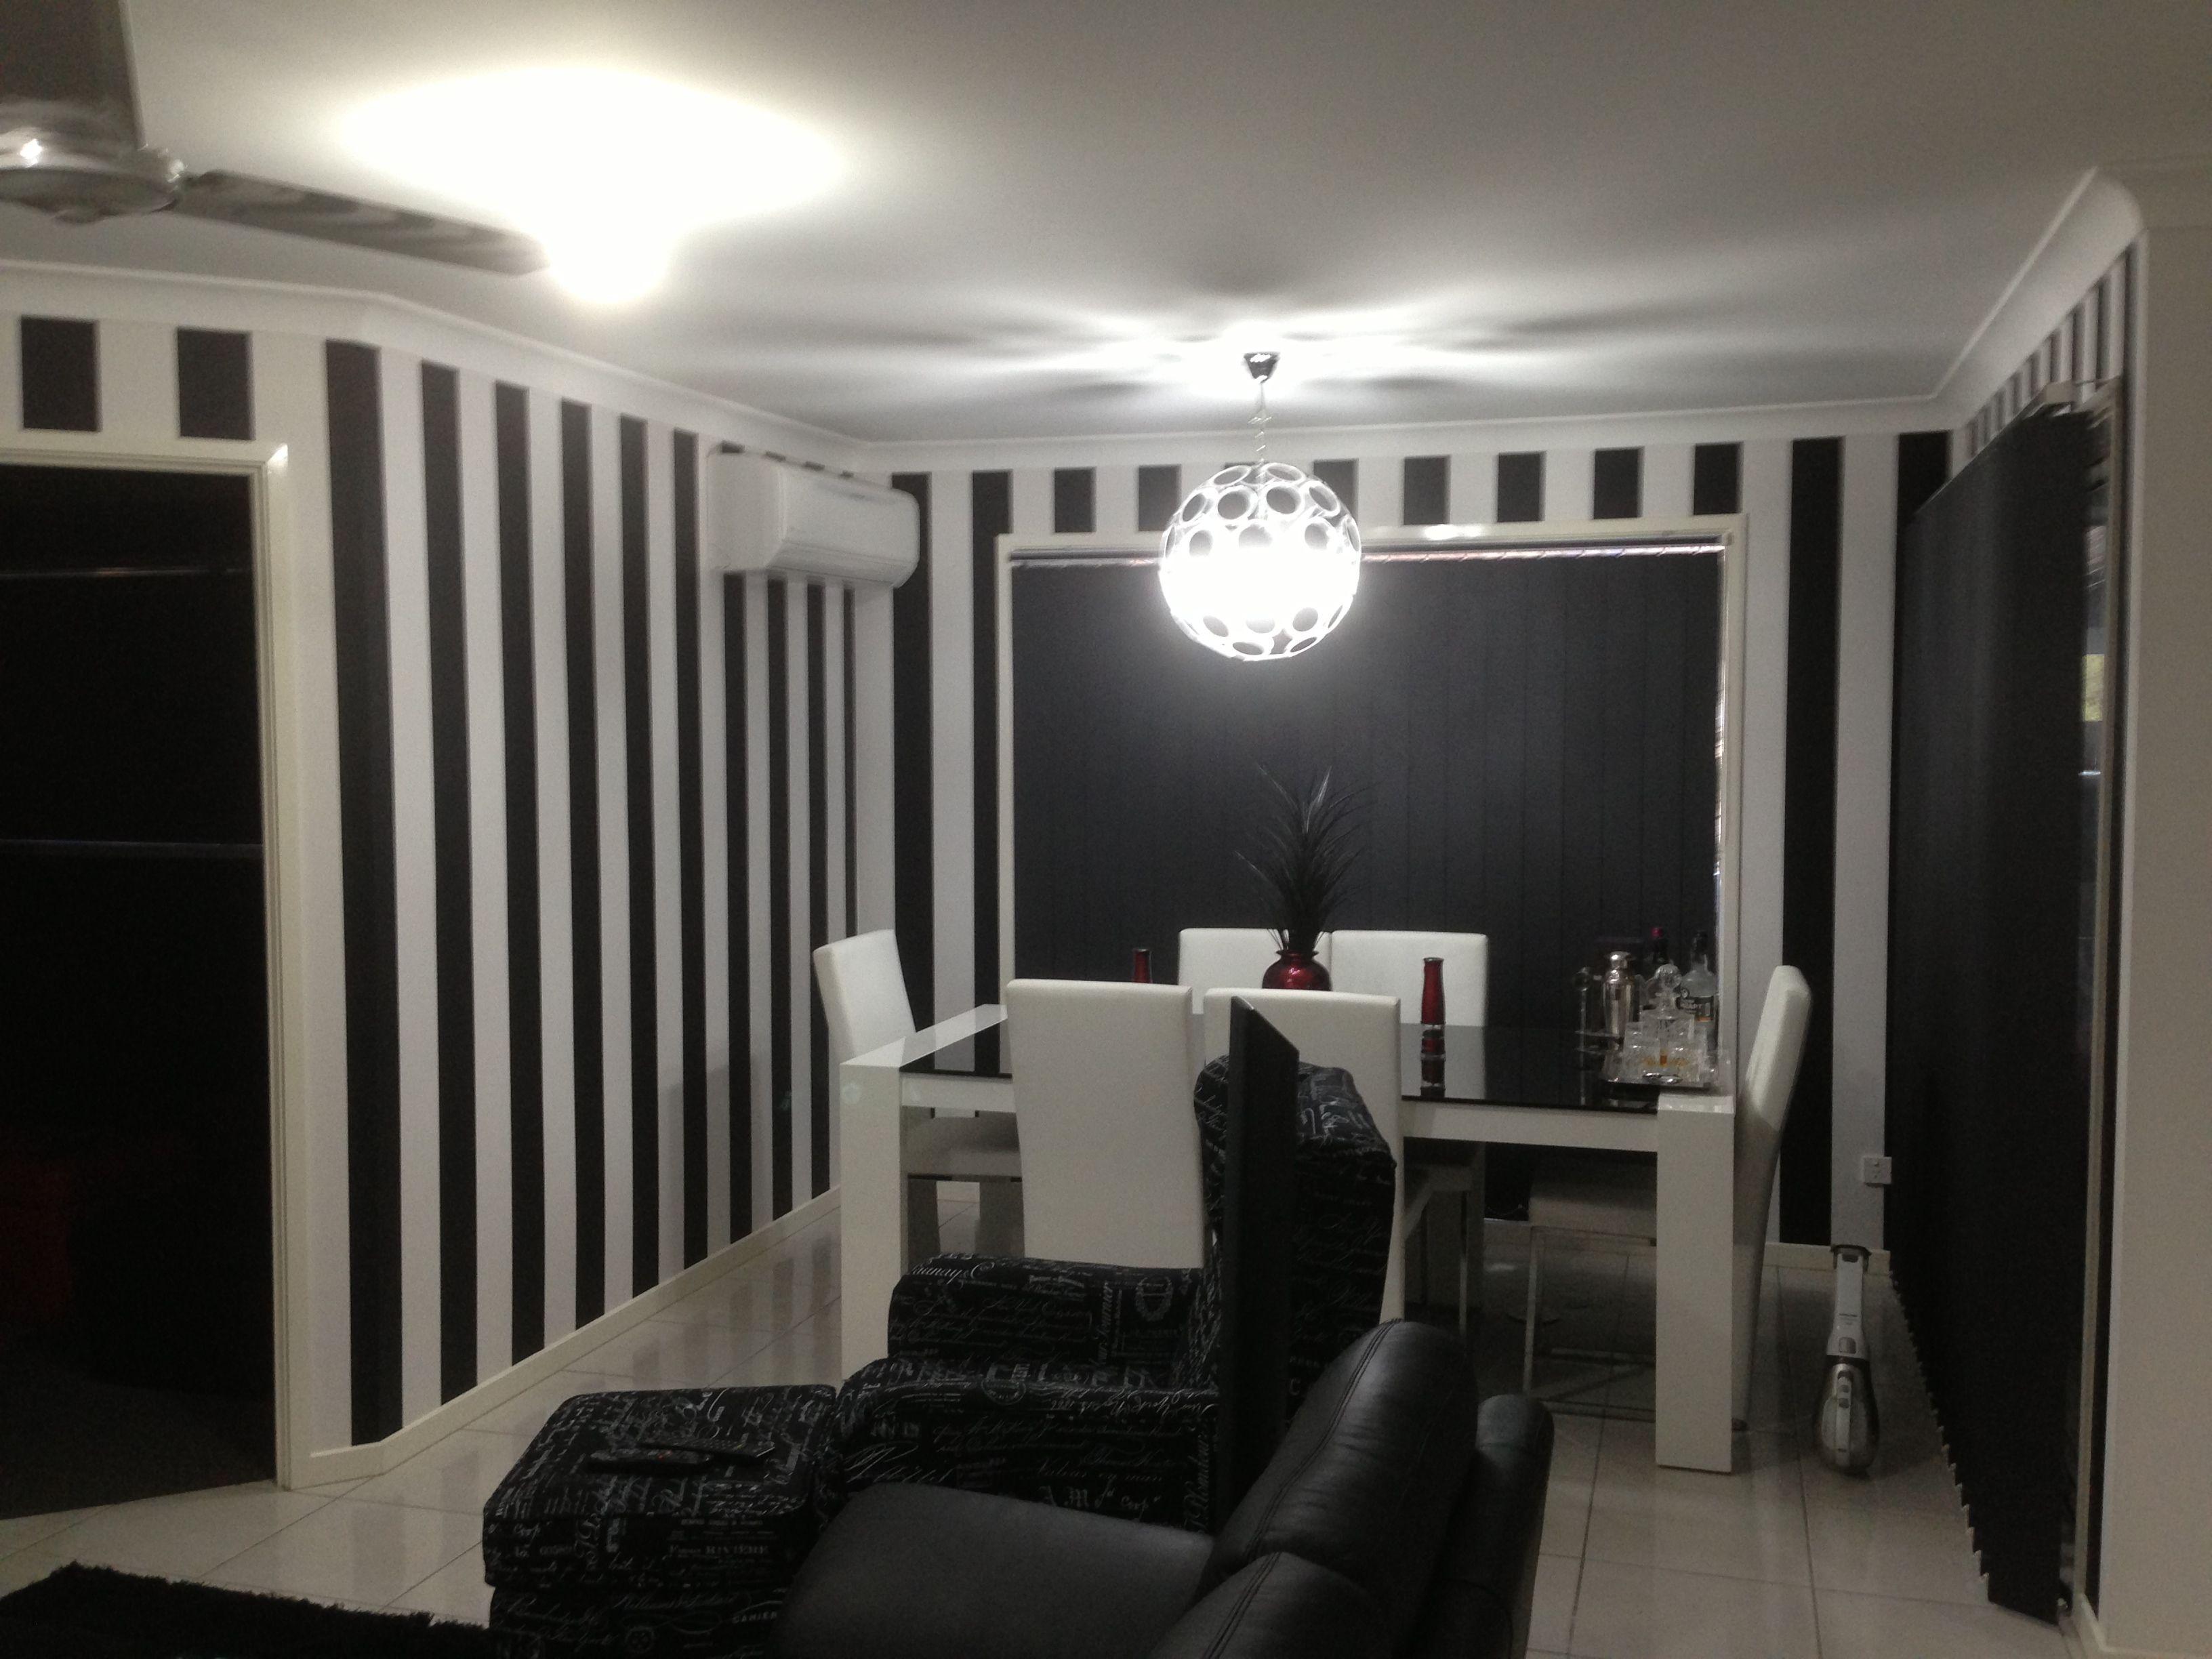 Monochrome Vertical Stripes Black And White Wallpaper Striped Wallpaper Home Wallpaper White Wallpaper Black And White Wallpaper